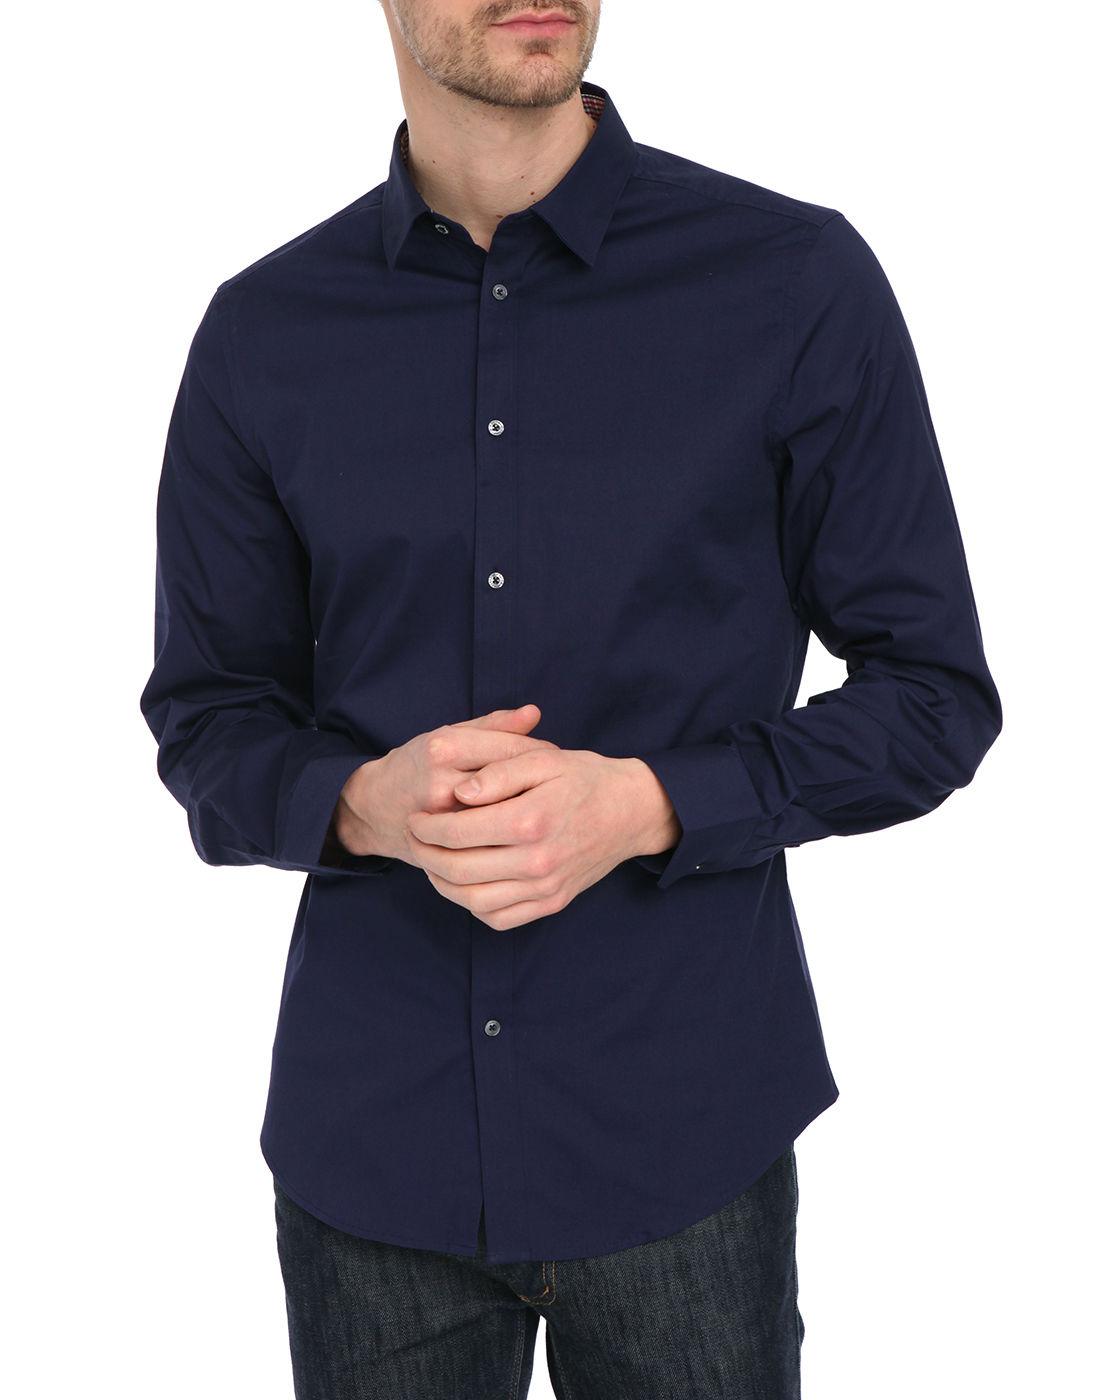 Ben sherman men 39 s stretch dress shirt black us size 17 5 for 17 33 shirt size